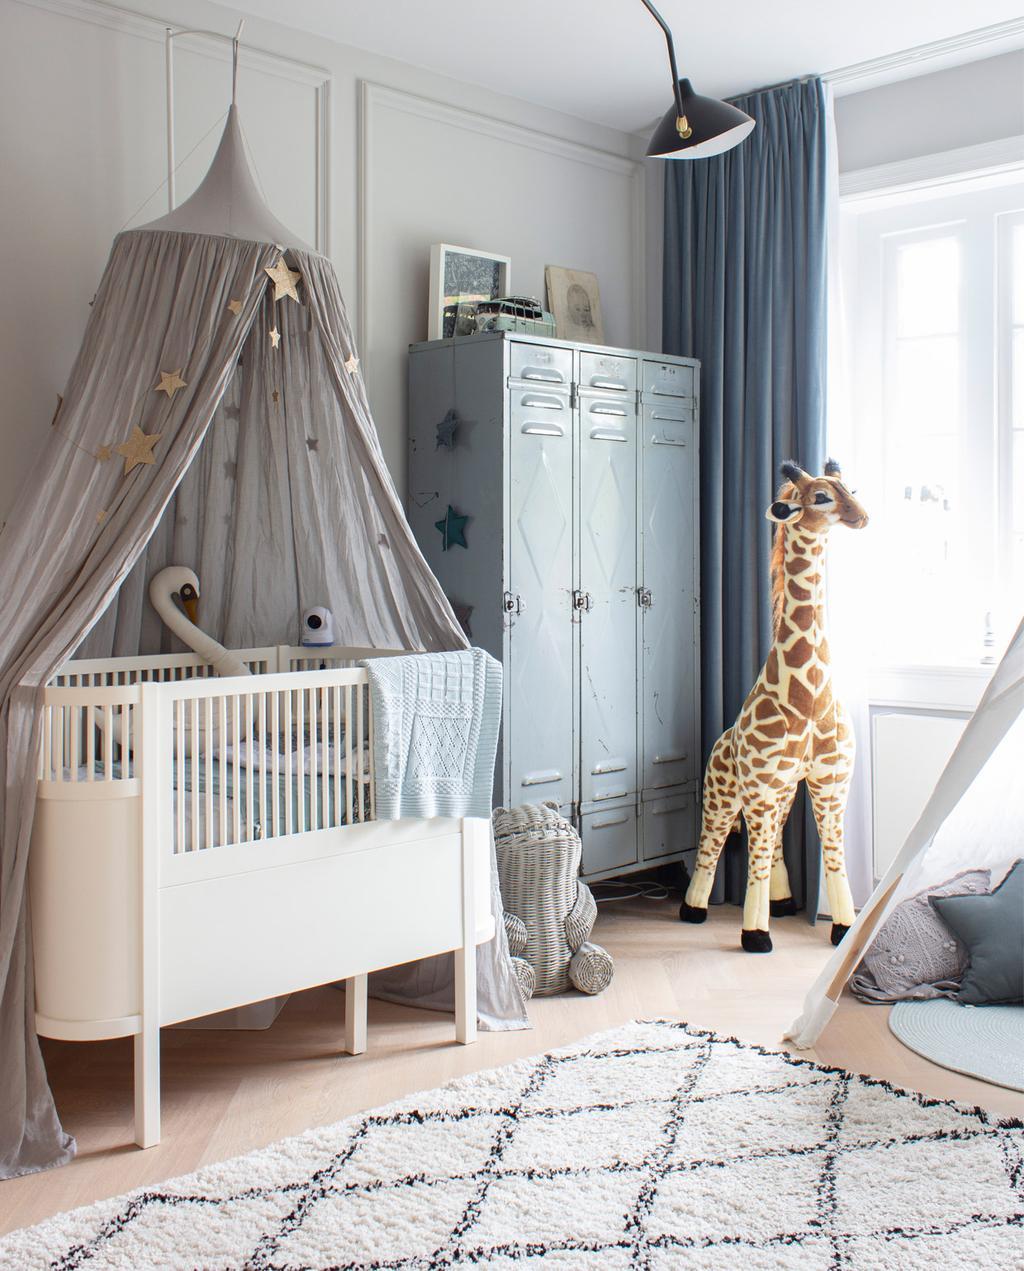 vtwonen | Scandinavische babykamer